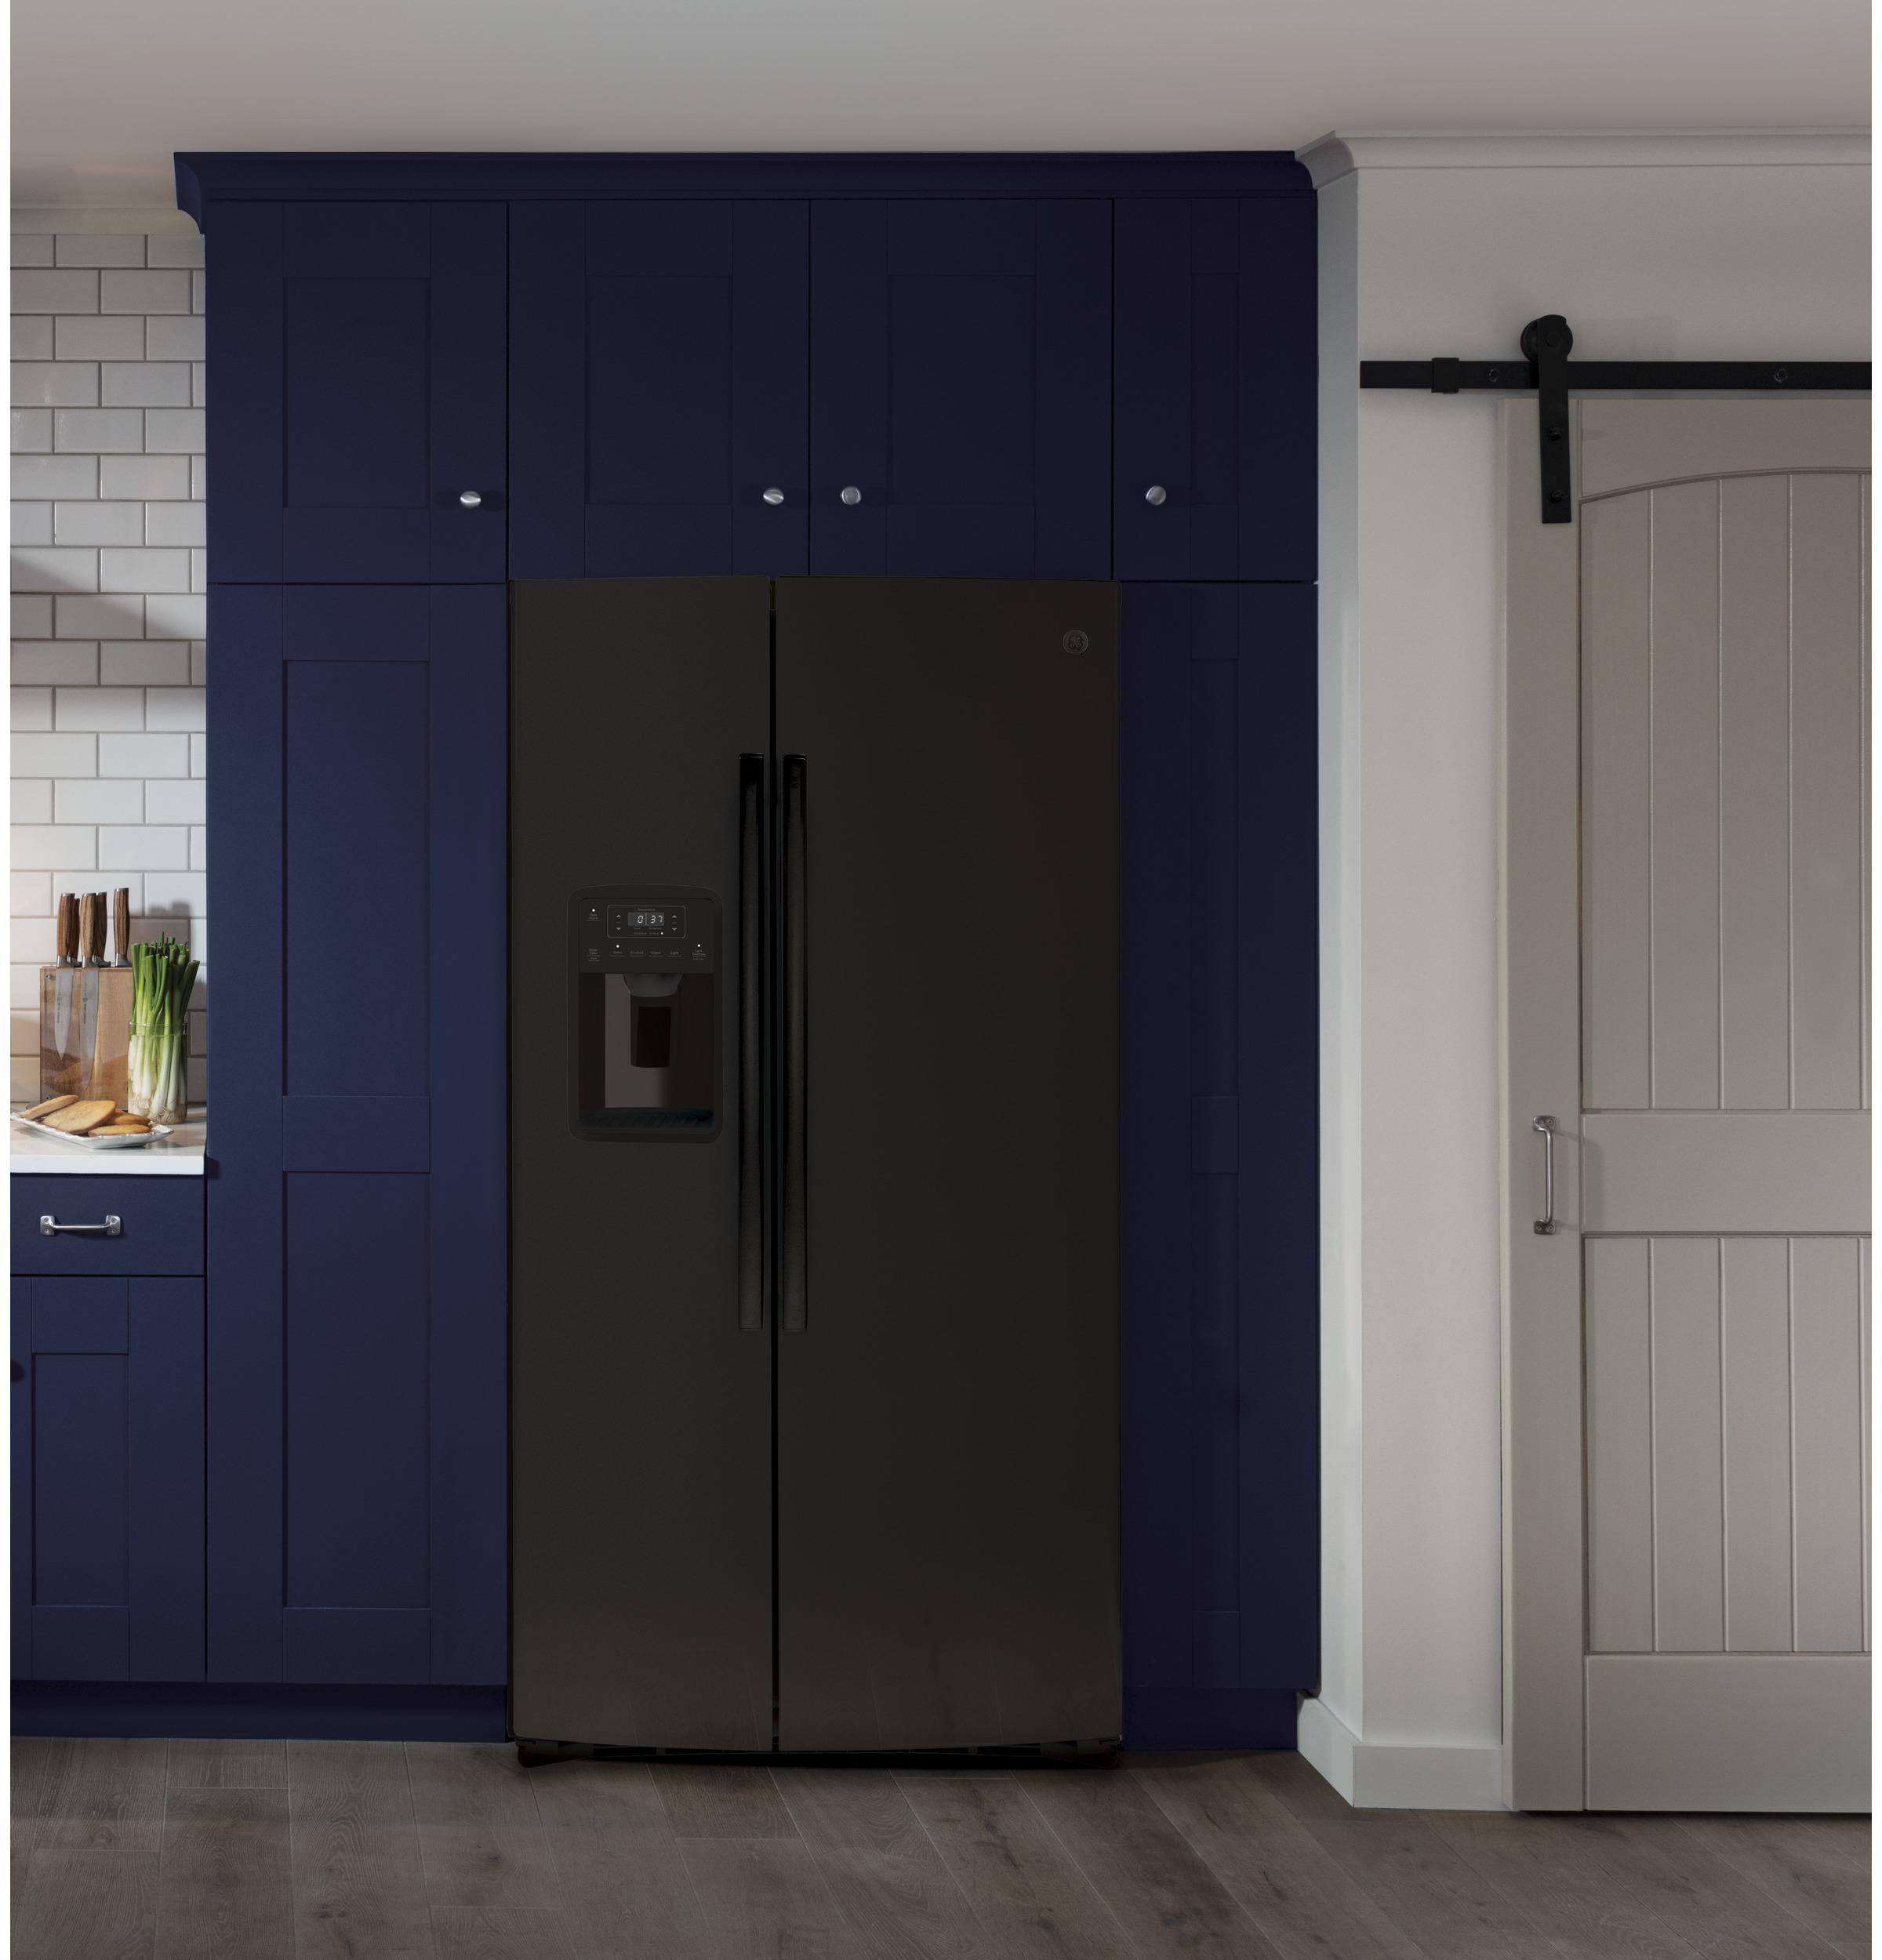 Model: GSS25IGNBB | GE GE® 25.1 Cu. Ft. Side-By-Side Refrigerator